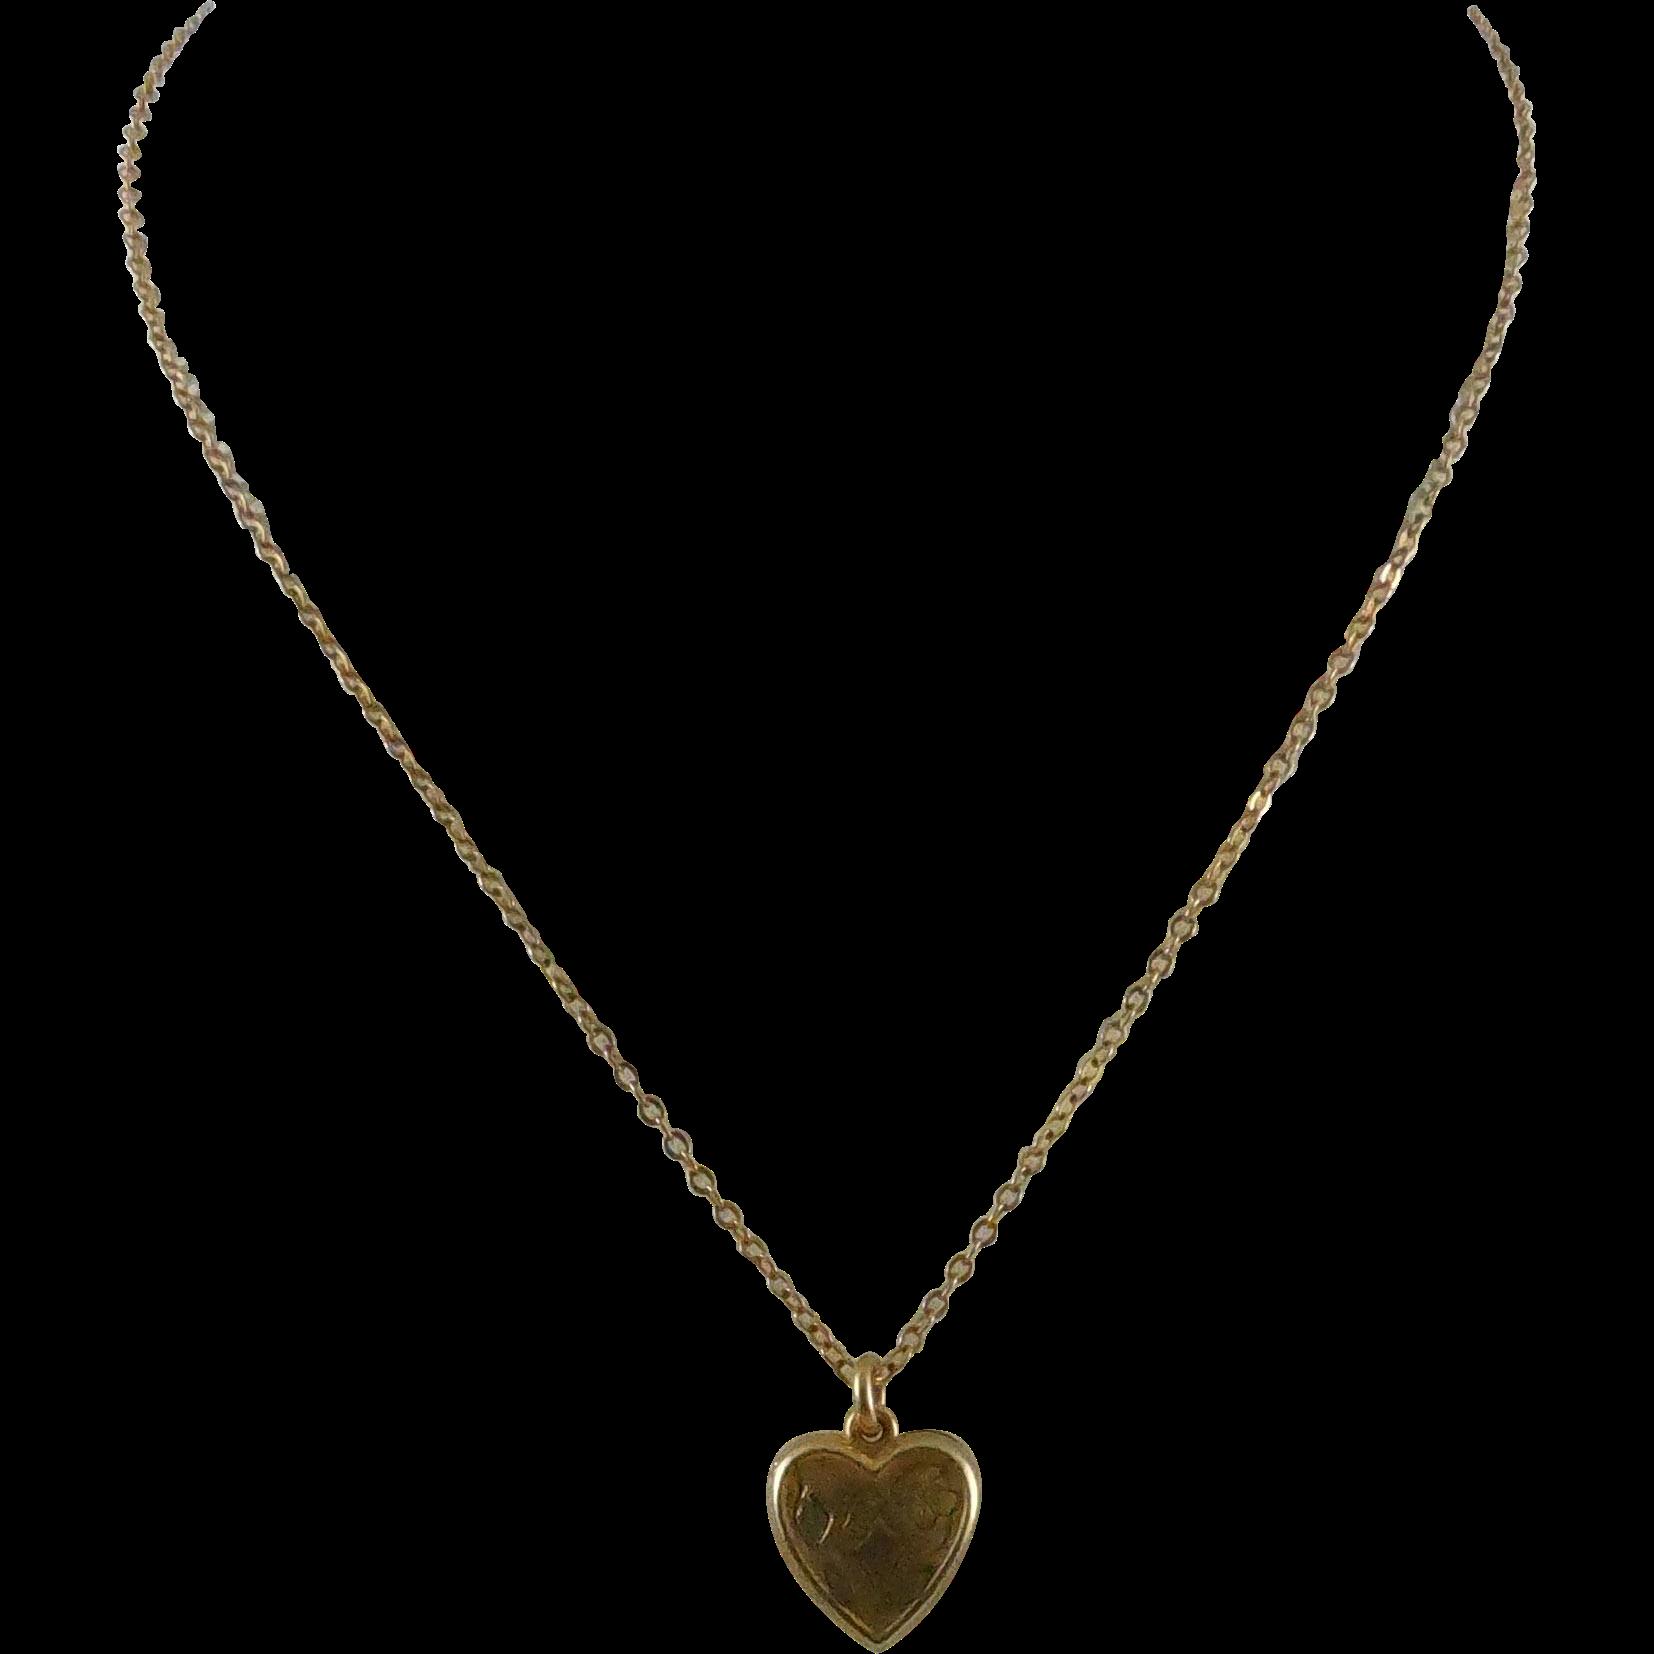 Sweet Signed LaMode Heart Shaped Locket - 1/20 12K GF